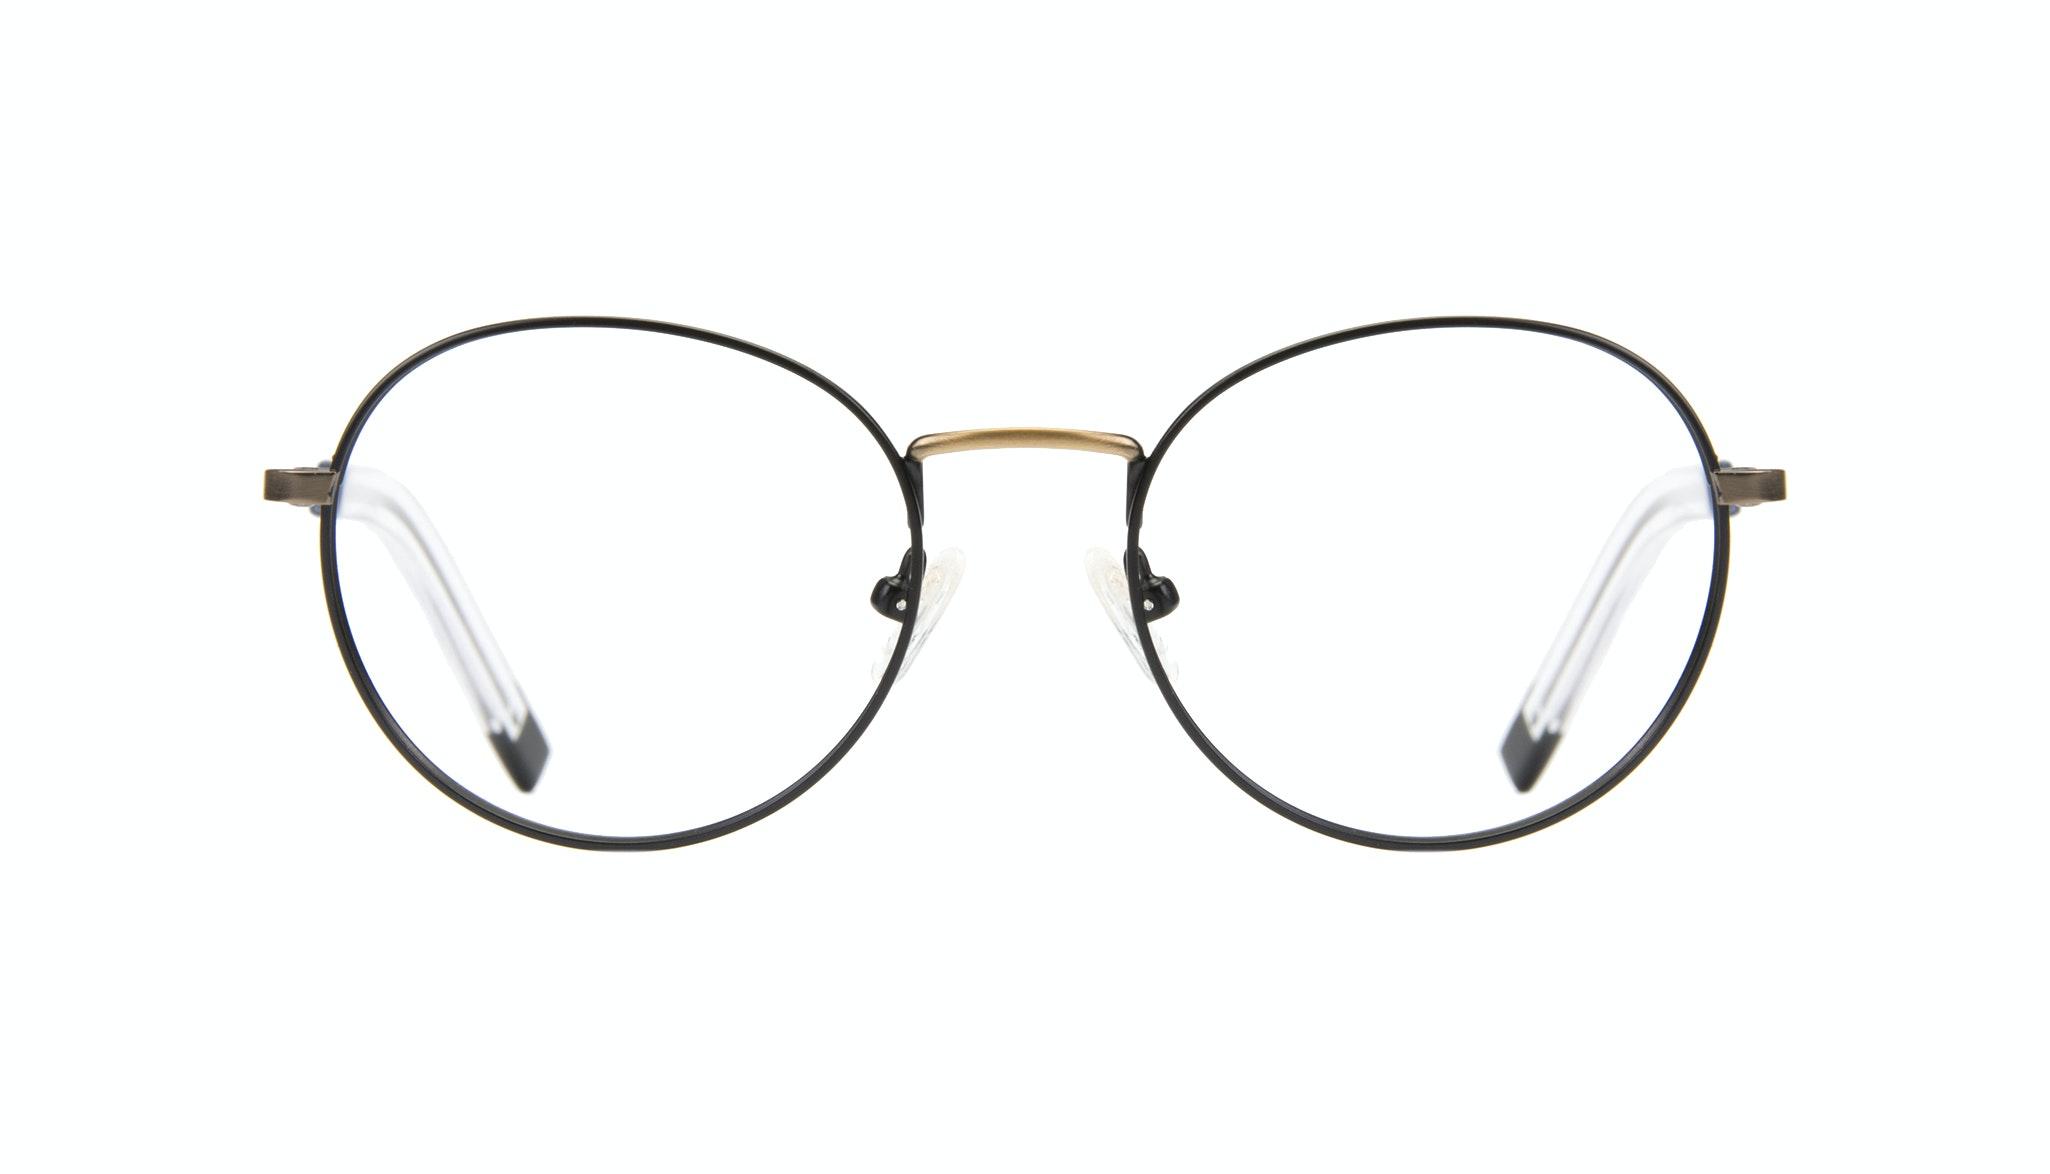 Affordable Fashion Glasses Round Eyeglasses Men Lean Dark Brass Front